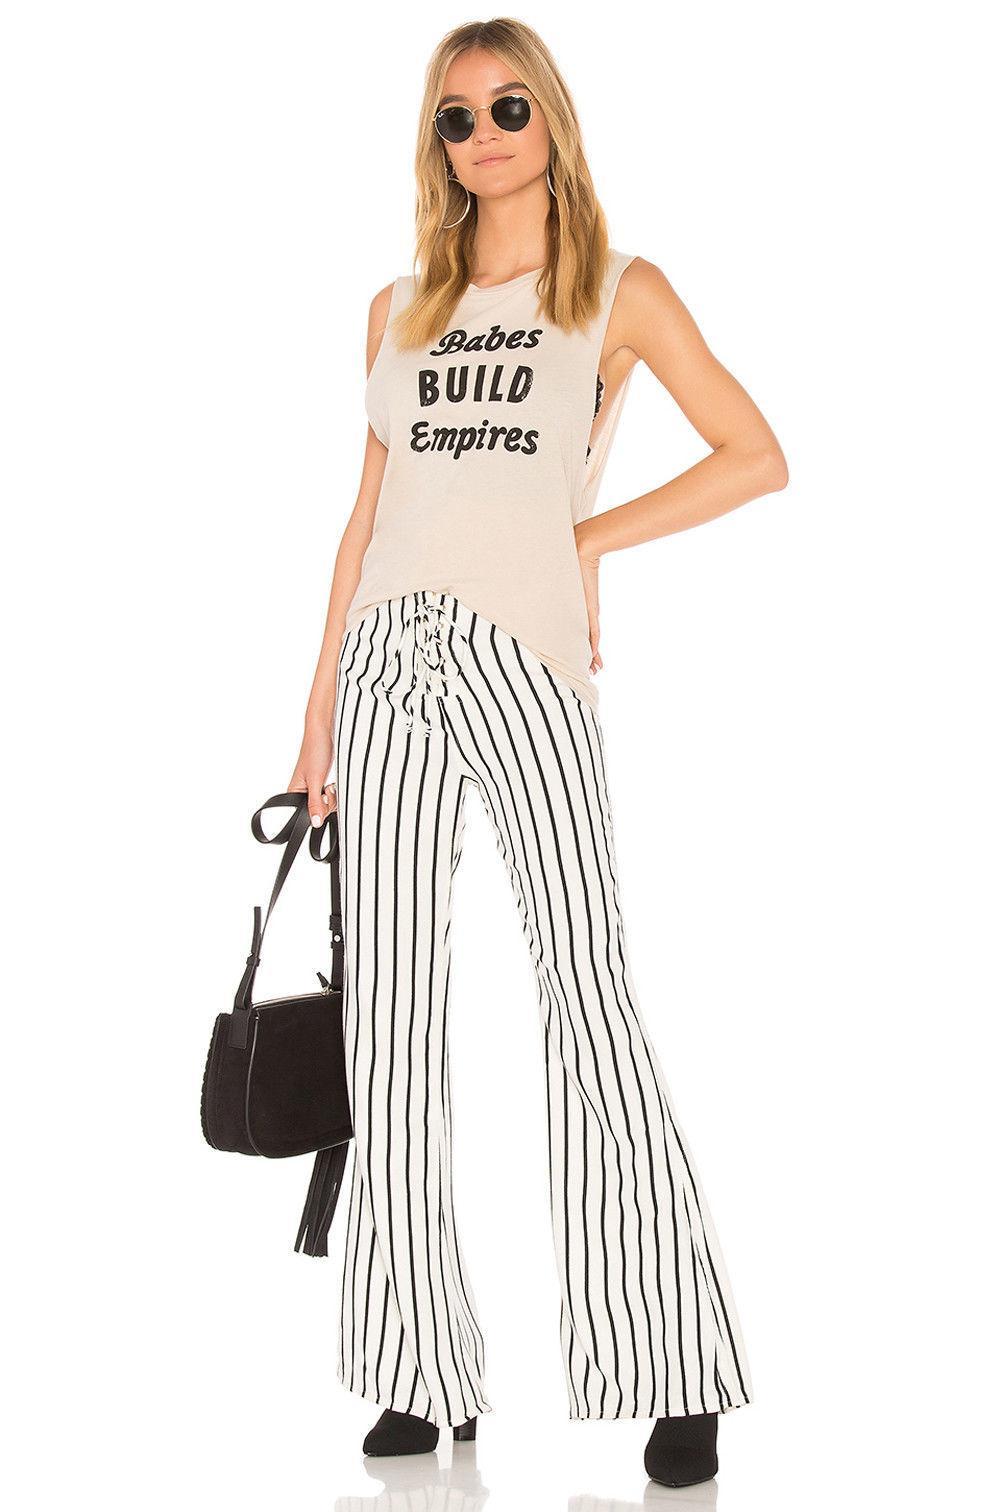 Mode Frauen Hohe Taille Retro Boho Lange Hosen Palazzo Vintage Breite Bein Lose Pailletten Damen Flare Hose